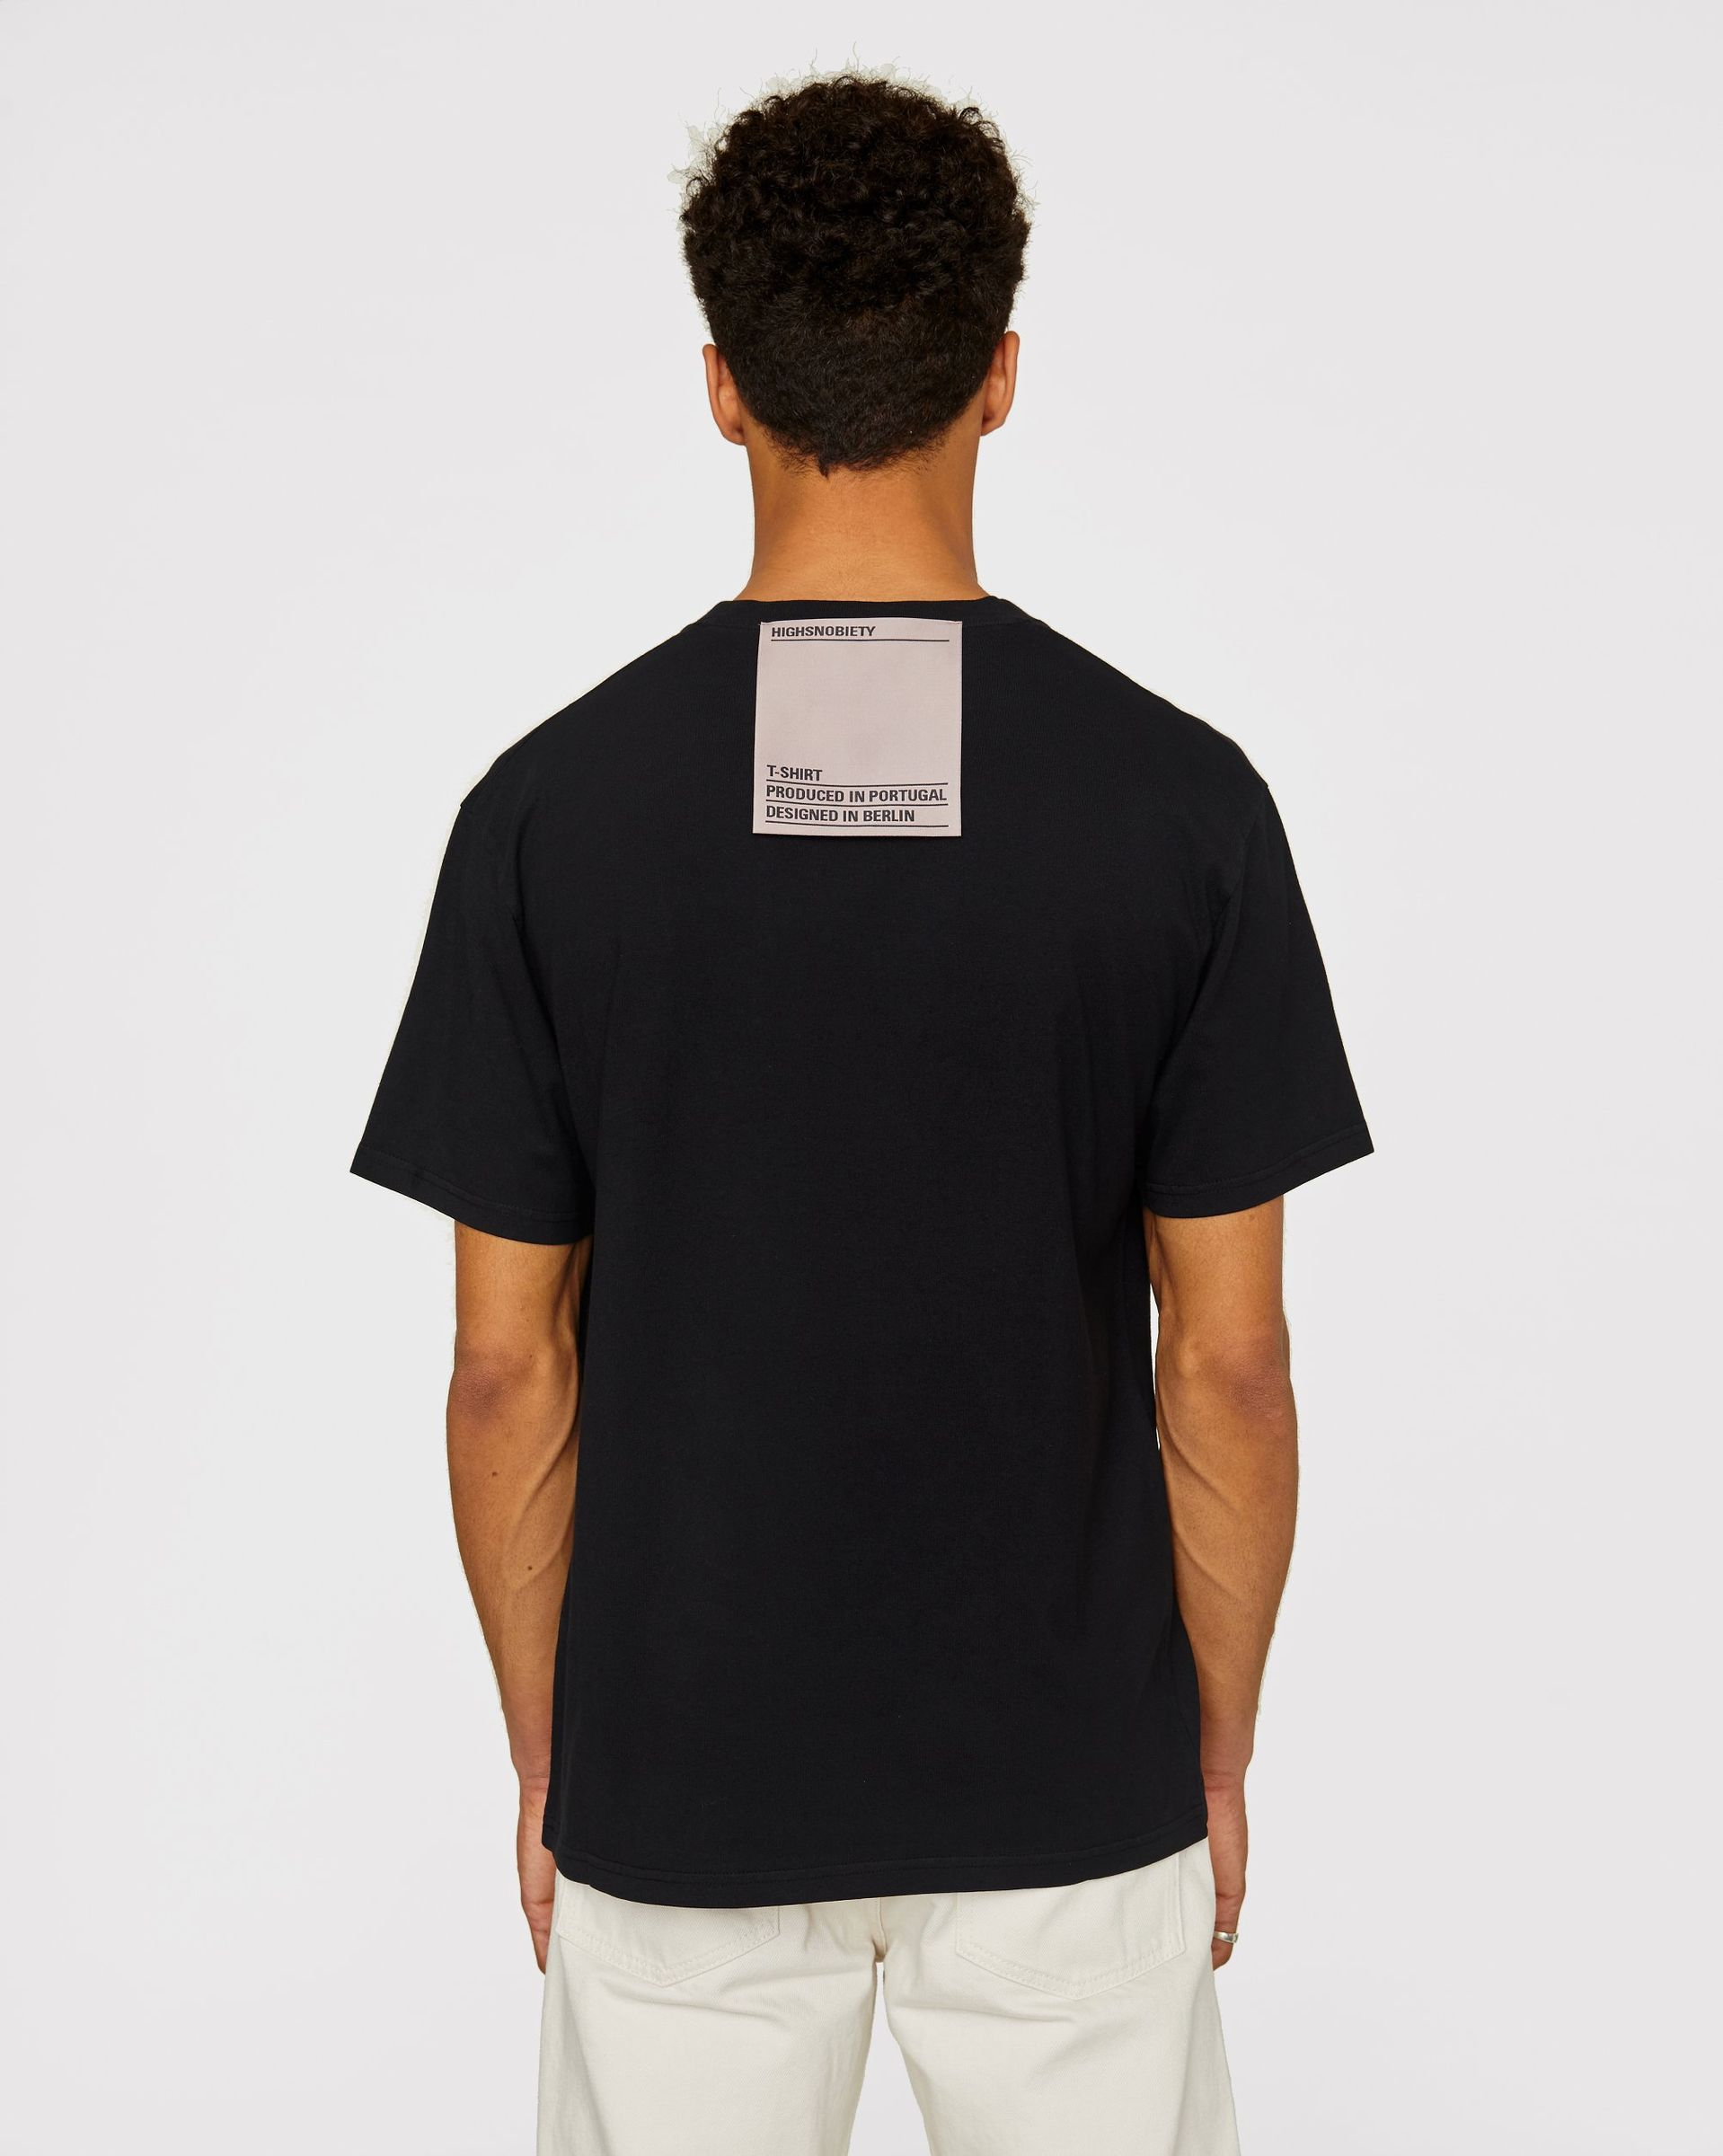 Highsnobiety Staples - T-Shirt Black - Image 3